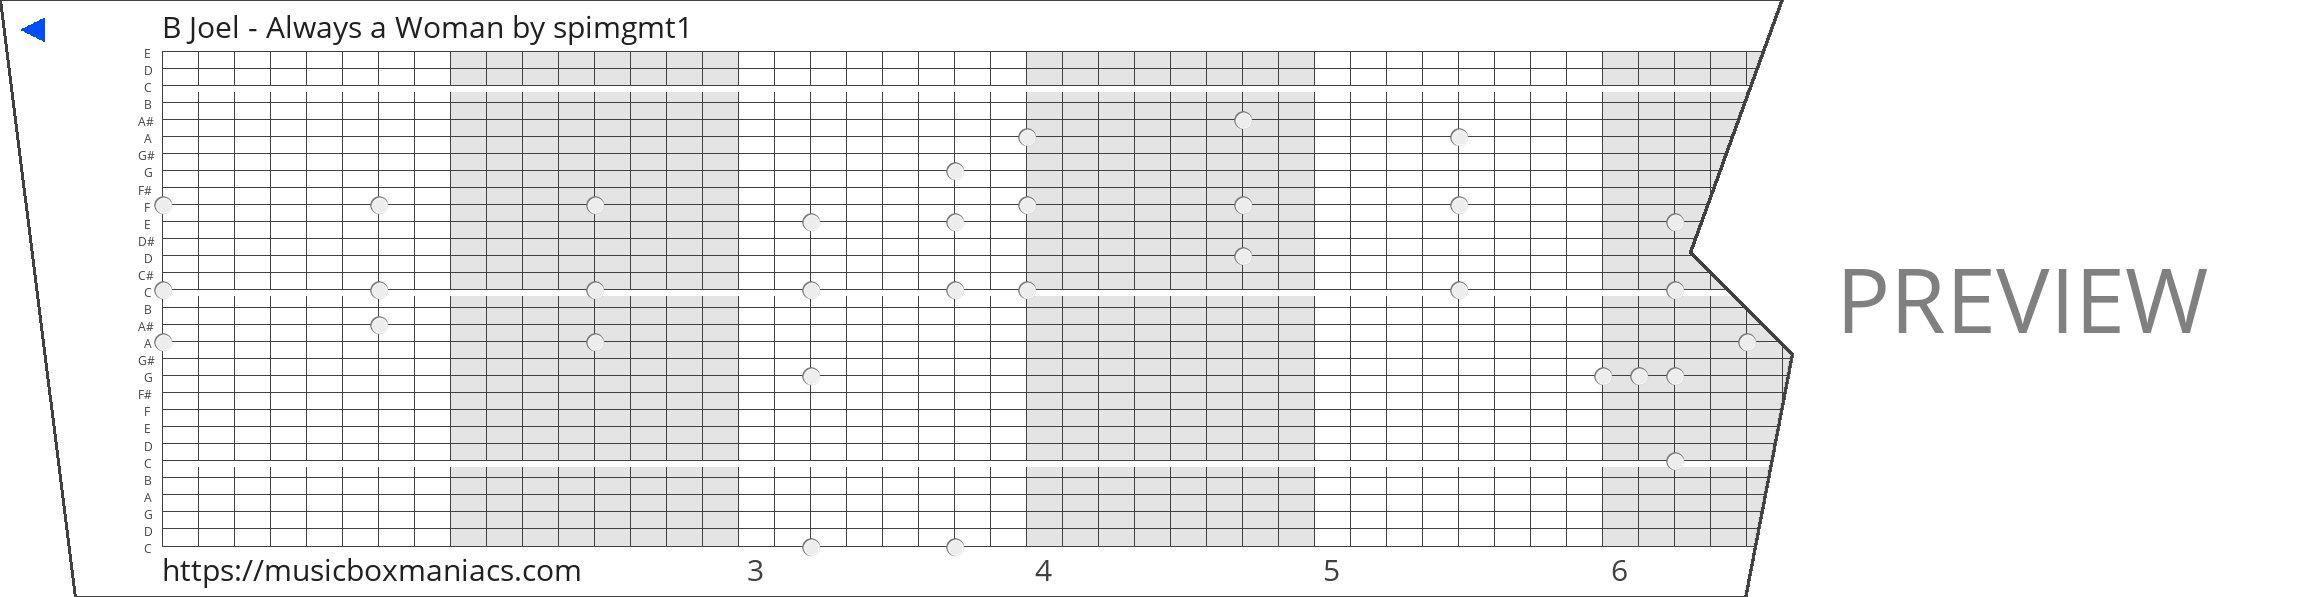 B Joel - Always a Woman 30 note music box paper strip